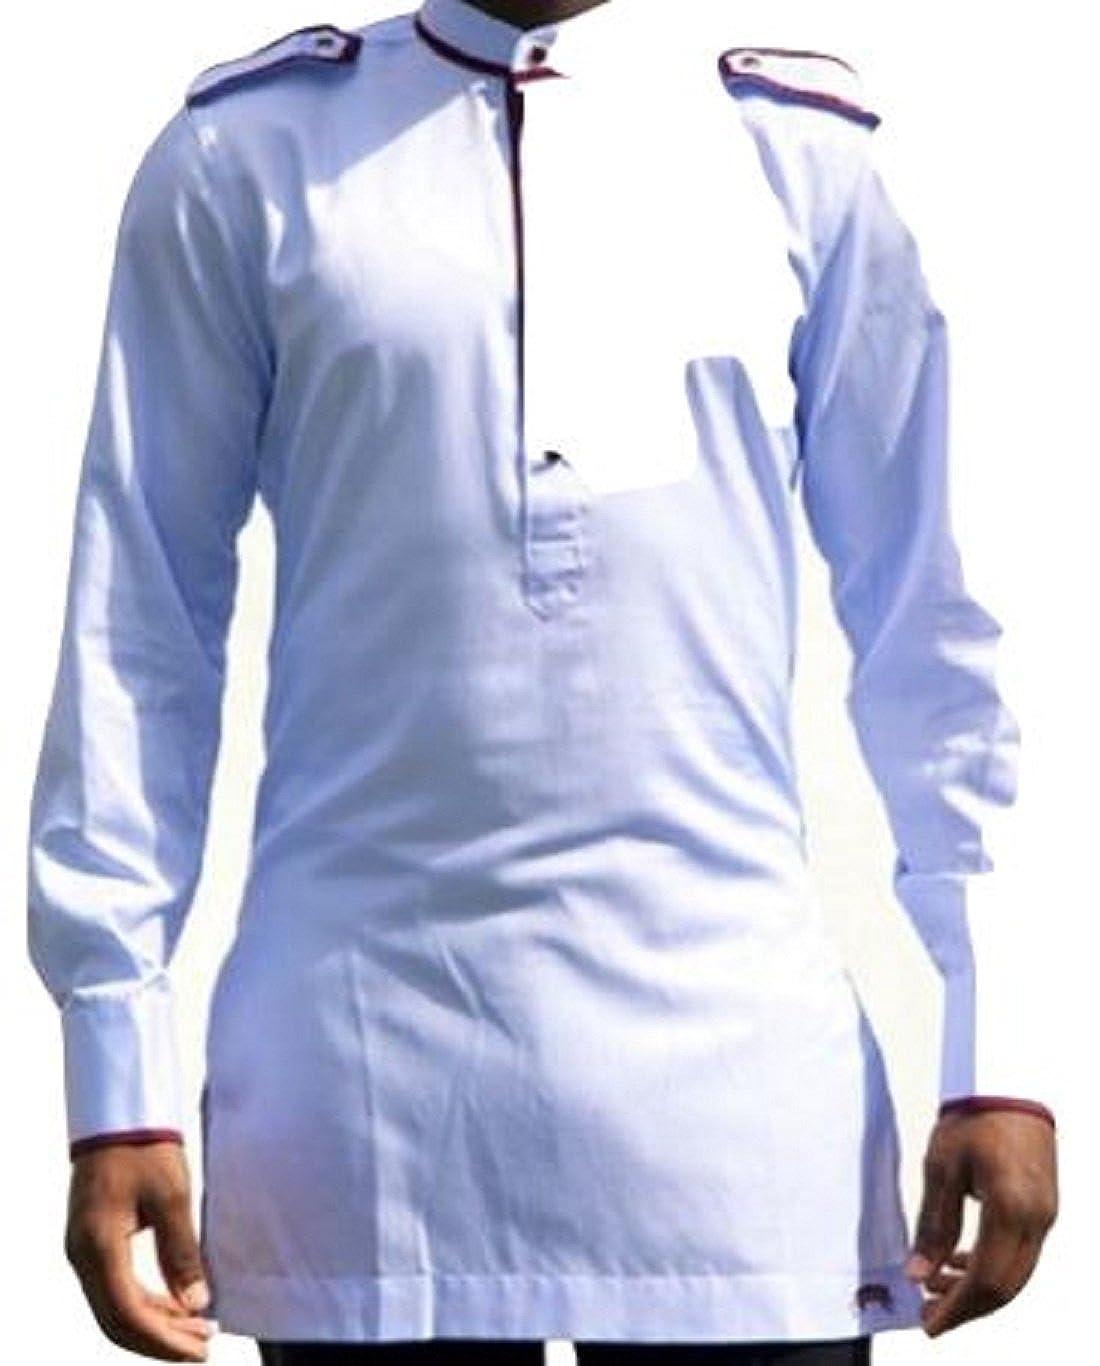 824e4f6c Amazon.com: Africa Blooms African Clothing for Men.Dashiki for Men-AfricanWear.Dashiki  Shirt: Clothing